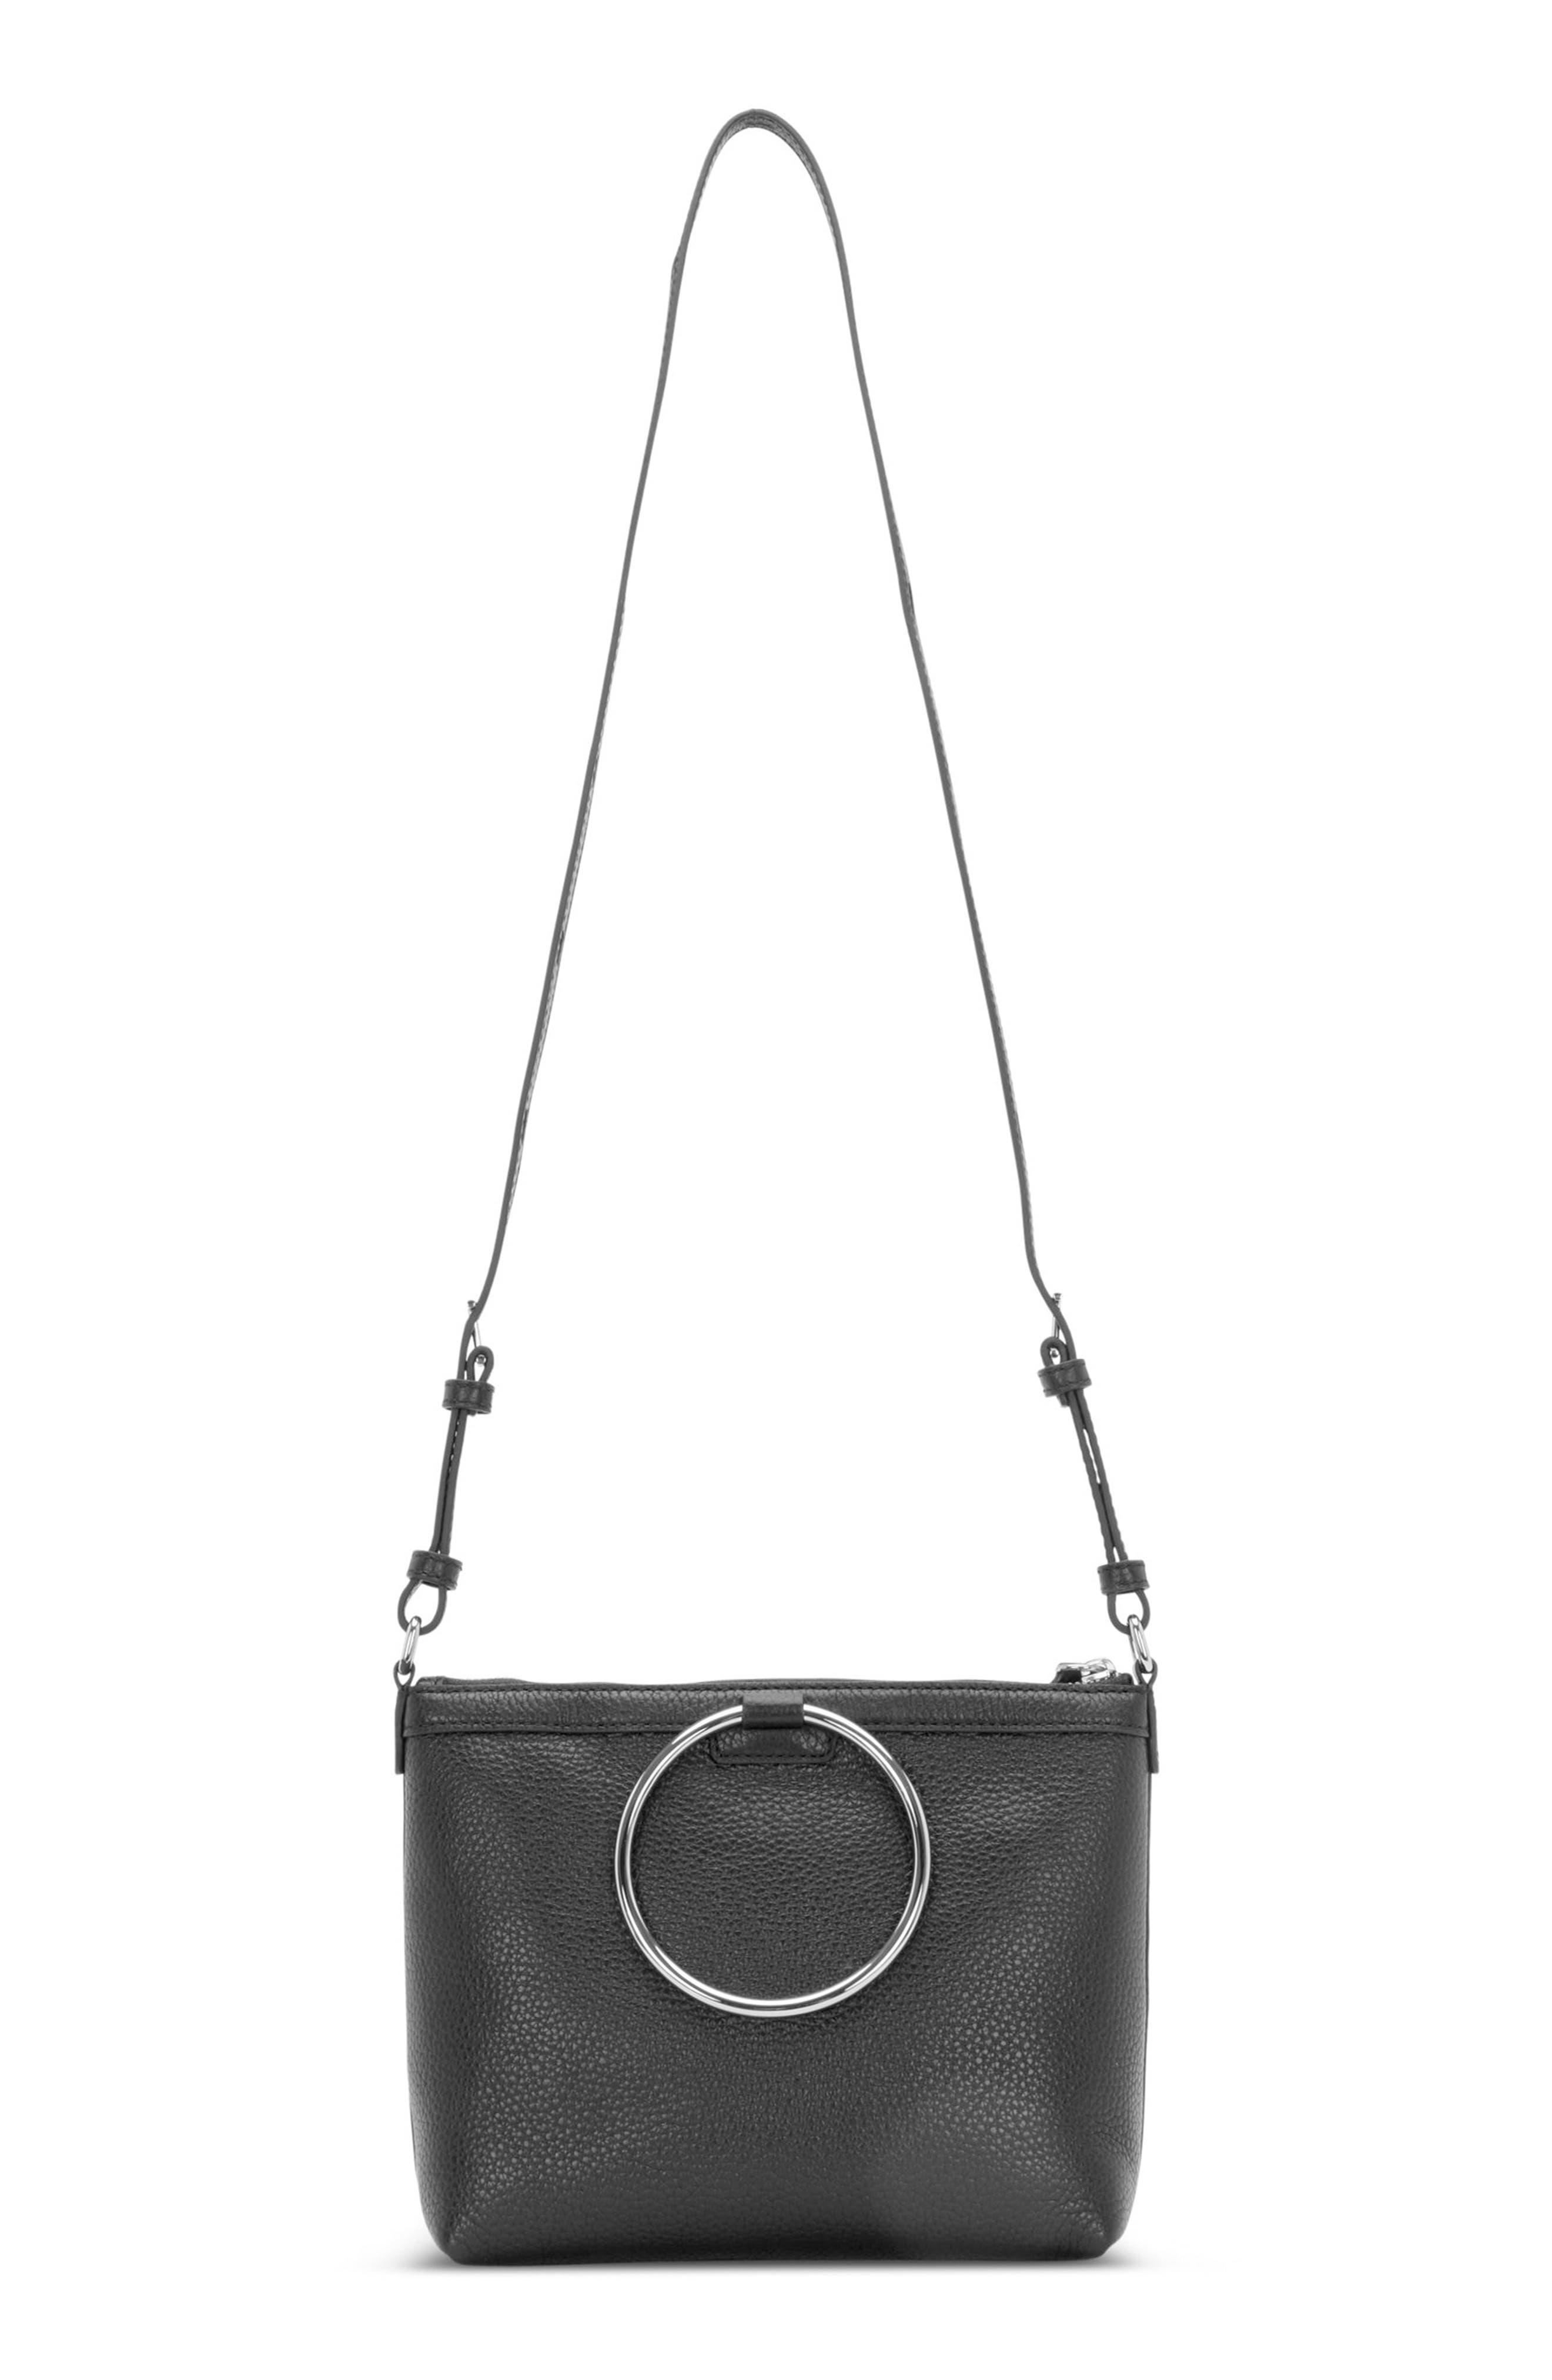 KARA Pebbled Leather Ring Crossbody Bag